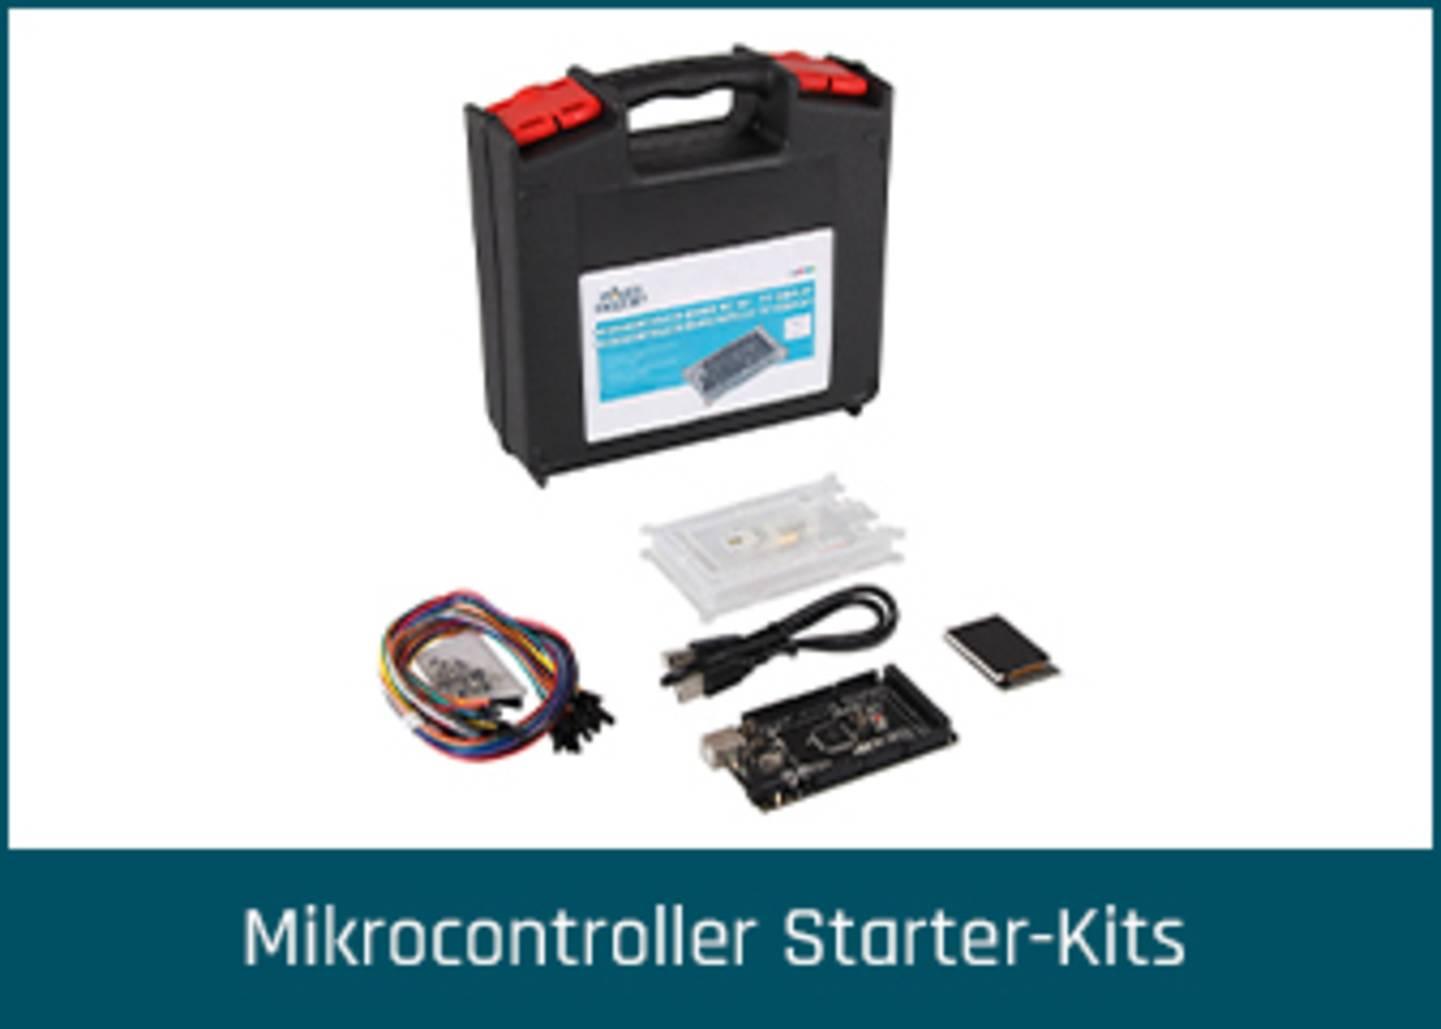 MAKERFACTORY Mikrocontroller Starter-Kits